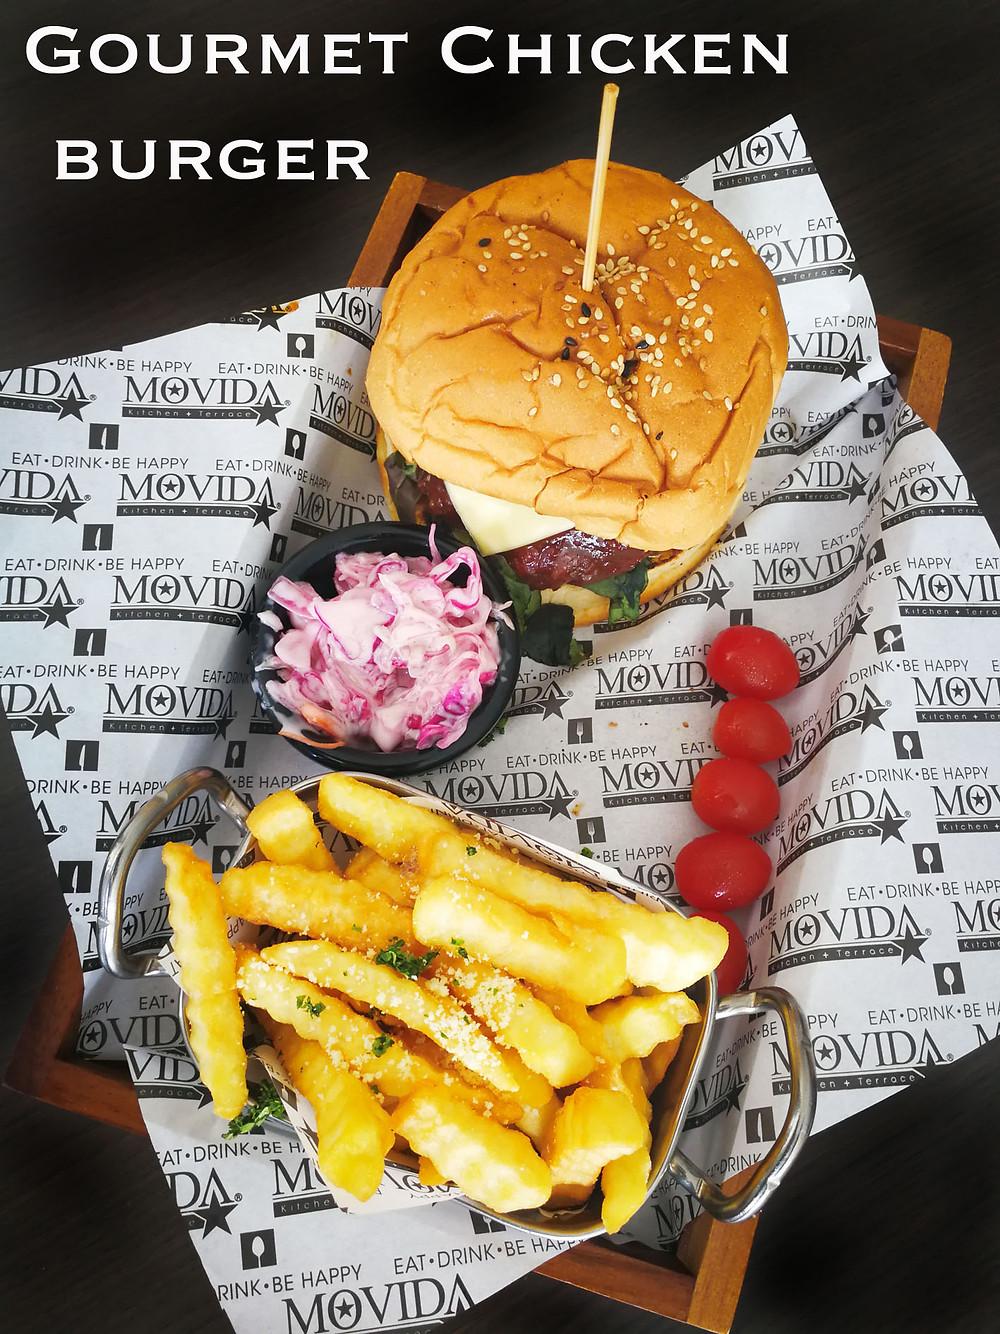 serembanonline photograph of the Gourmet Chicken burger at MoVida, d'Tempat Country Club at Sendayan by photographer Nic Falconer nicaliss